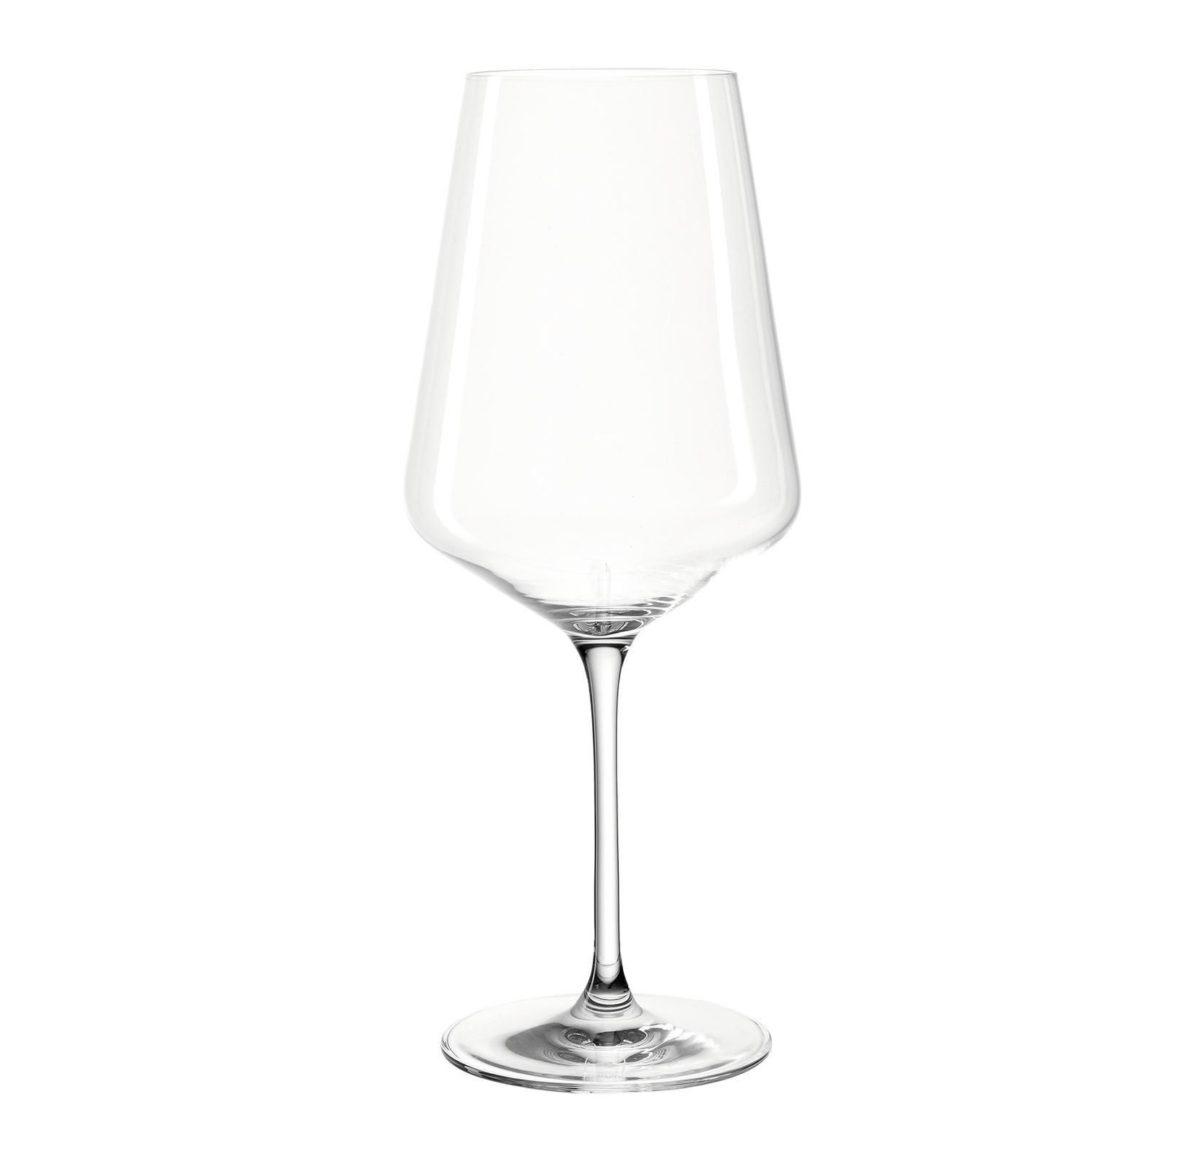 Leonardo RotweinglaeserSet Puccini 75 dl 6 Stueck N 007.xxl3  1200x1167 - Pahar pentru vin roșu Puccini 750 ml (L069554)